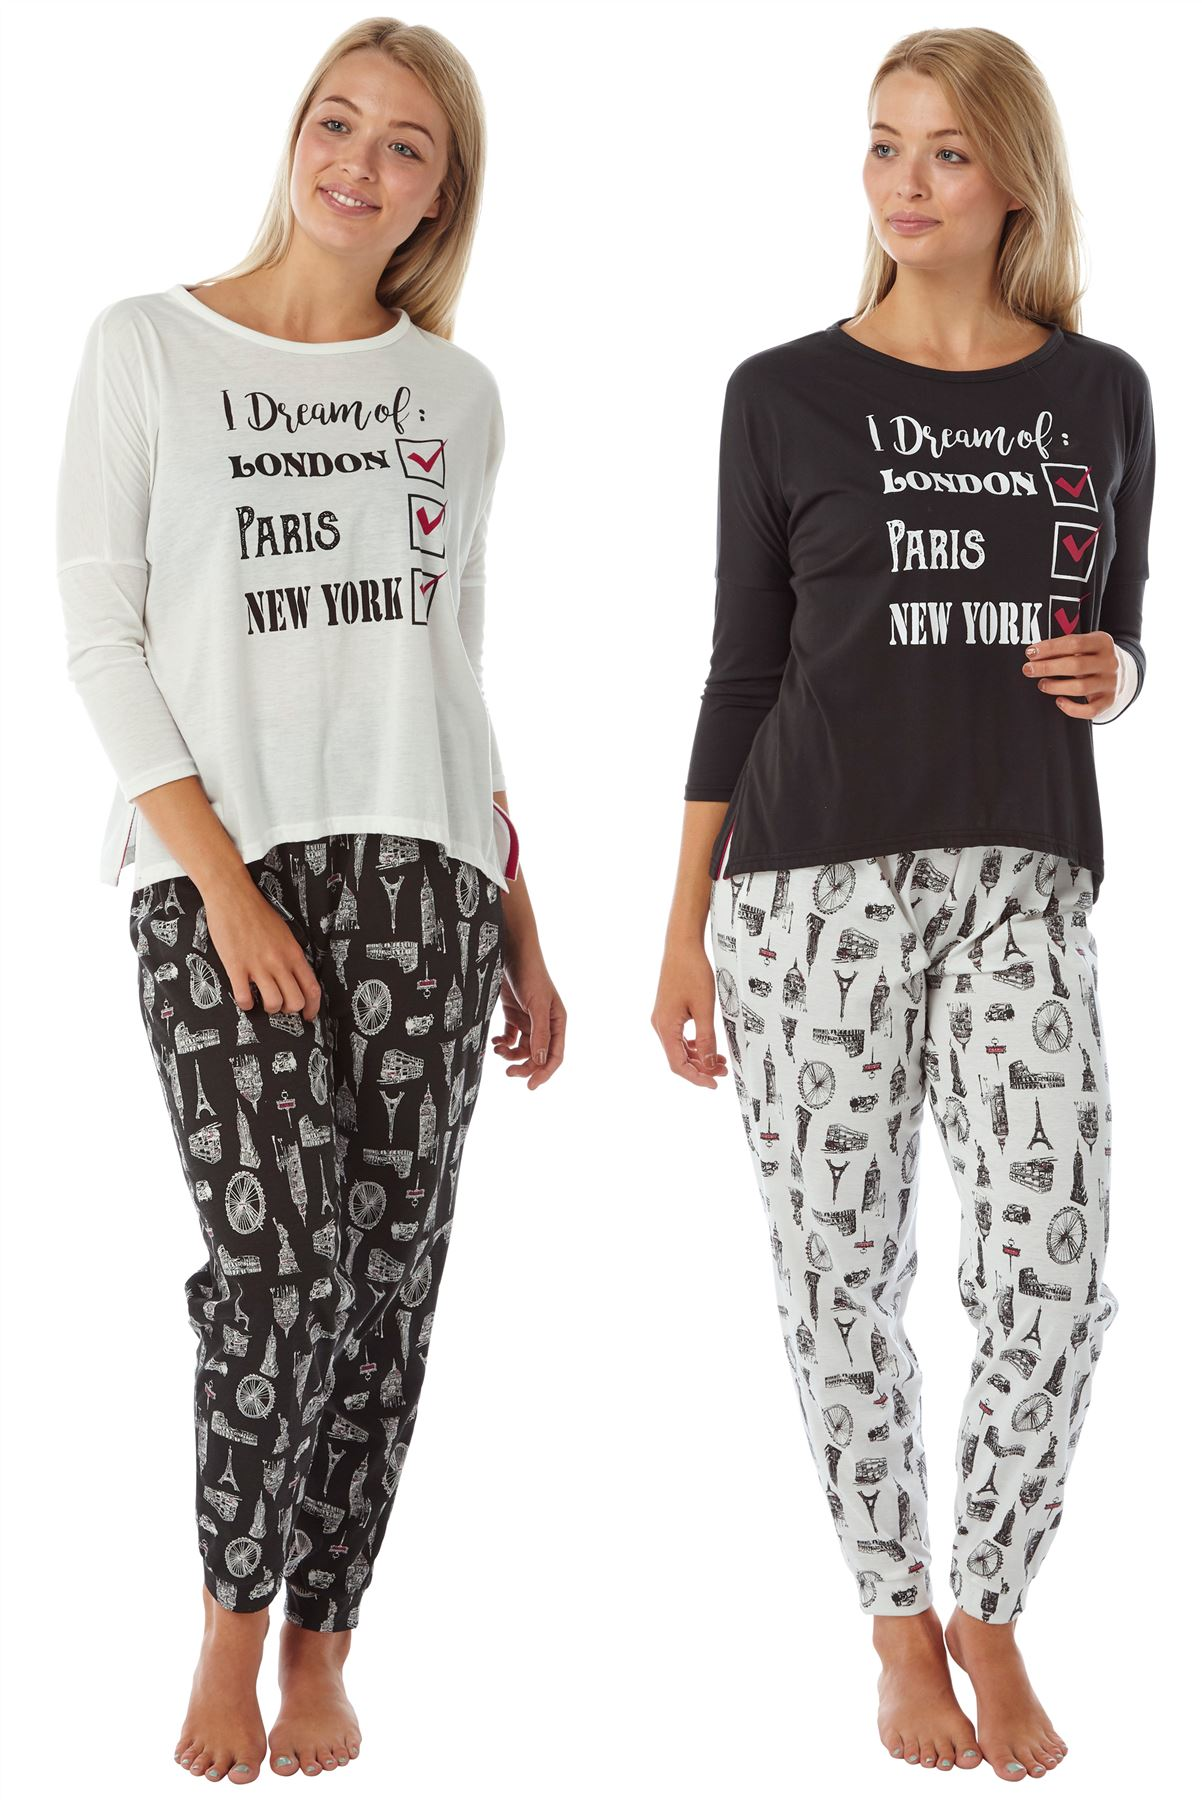 Details about Ladies Womens Bon Voyage Indigo Sky Long Pyjamas City Breaks  Pjs Nightwear 57835a9d2